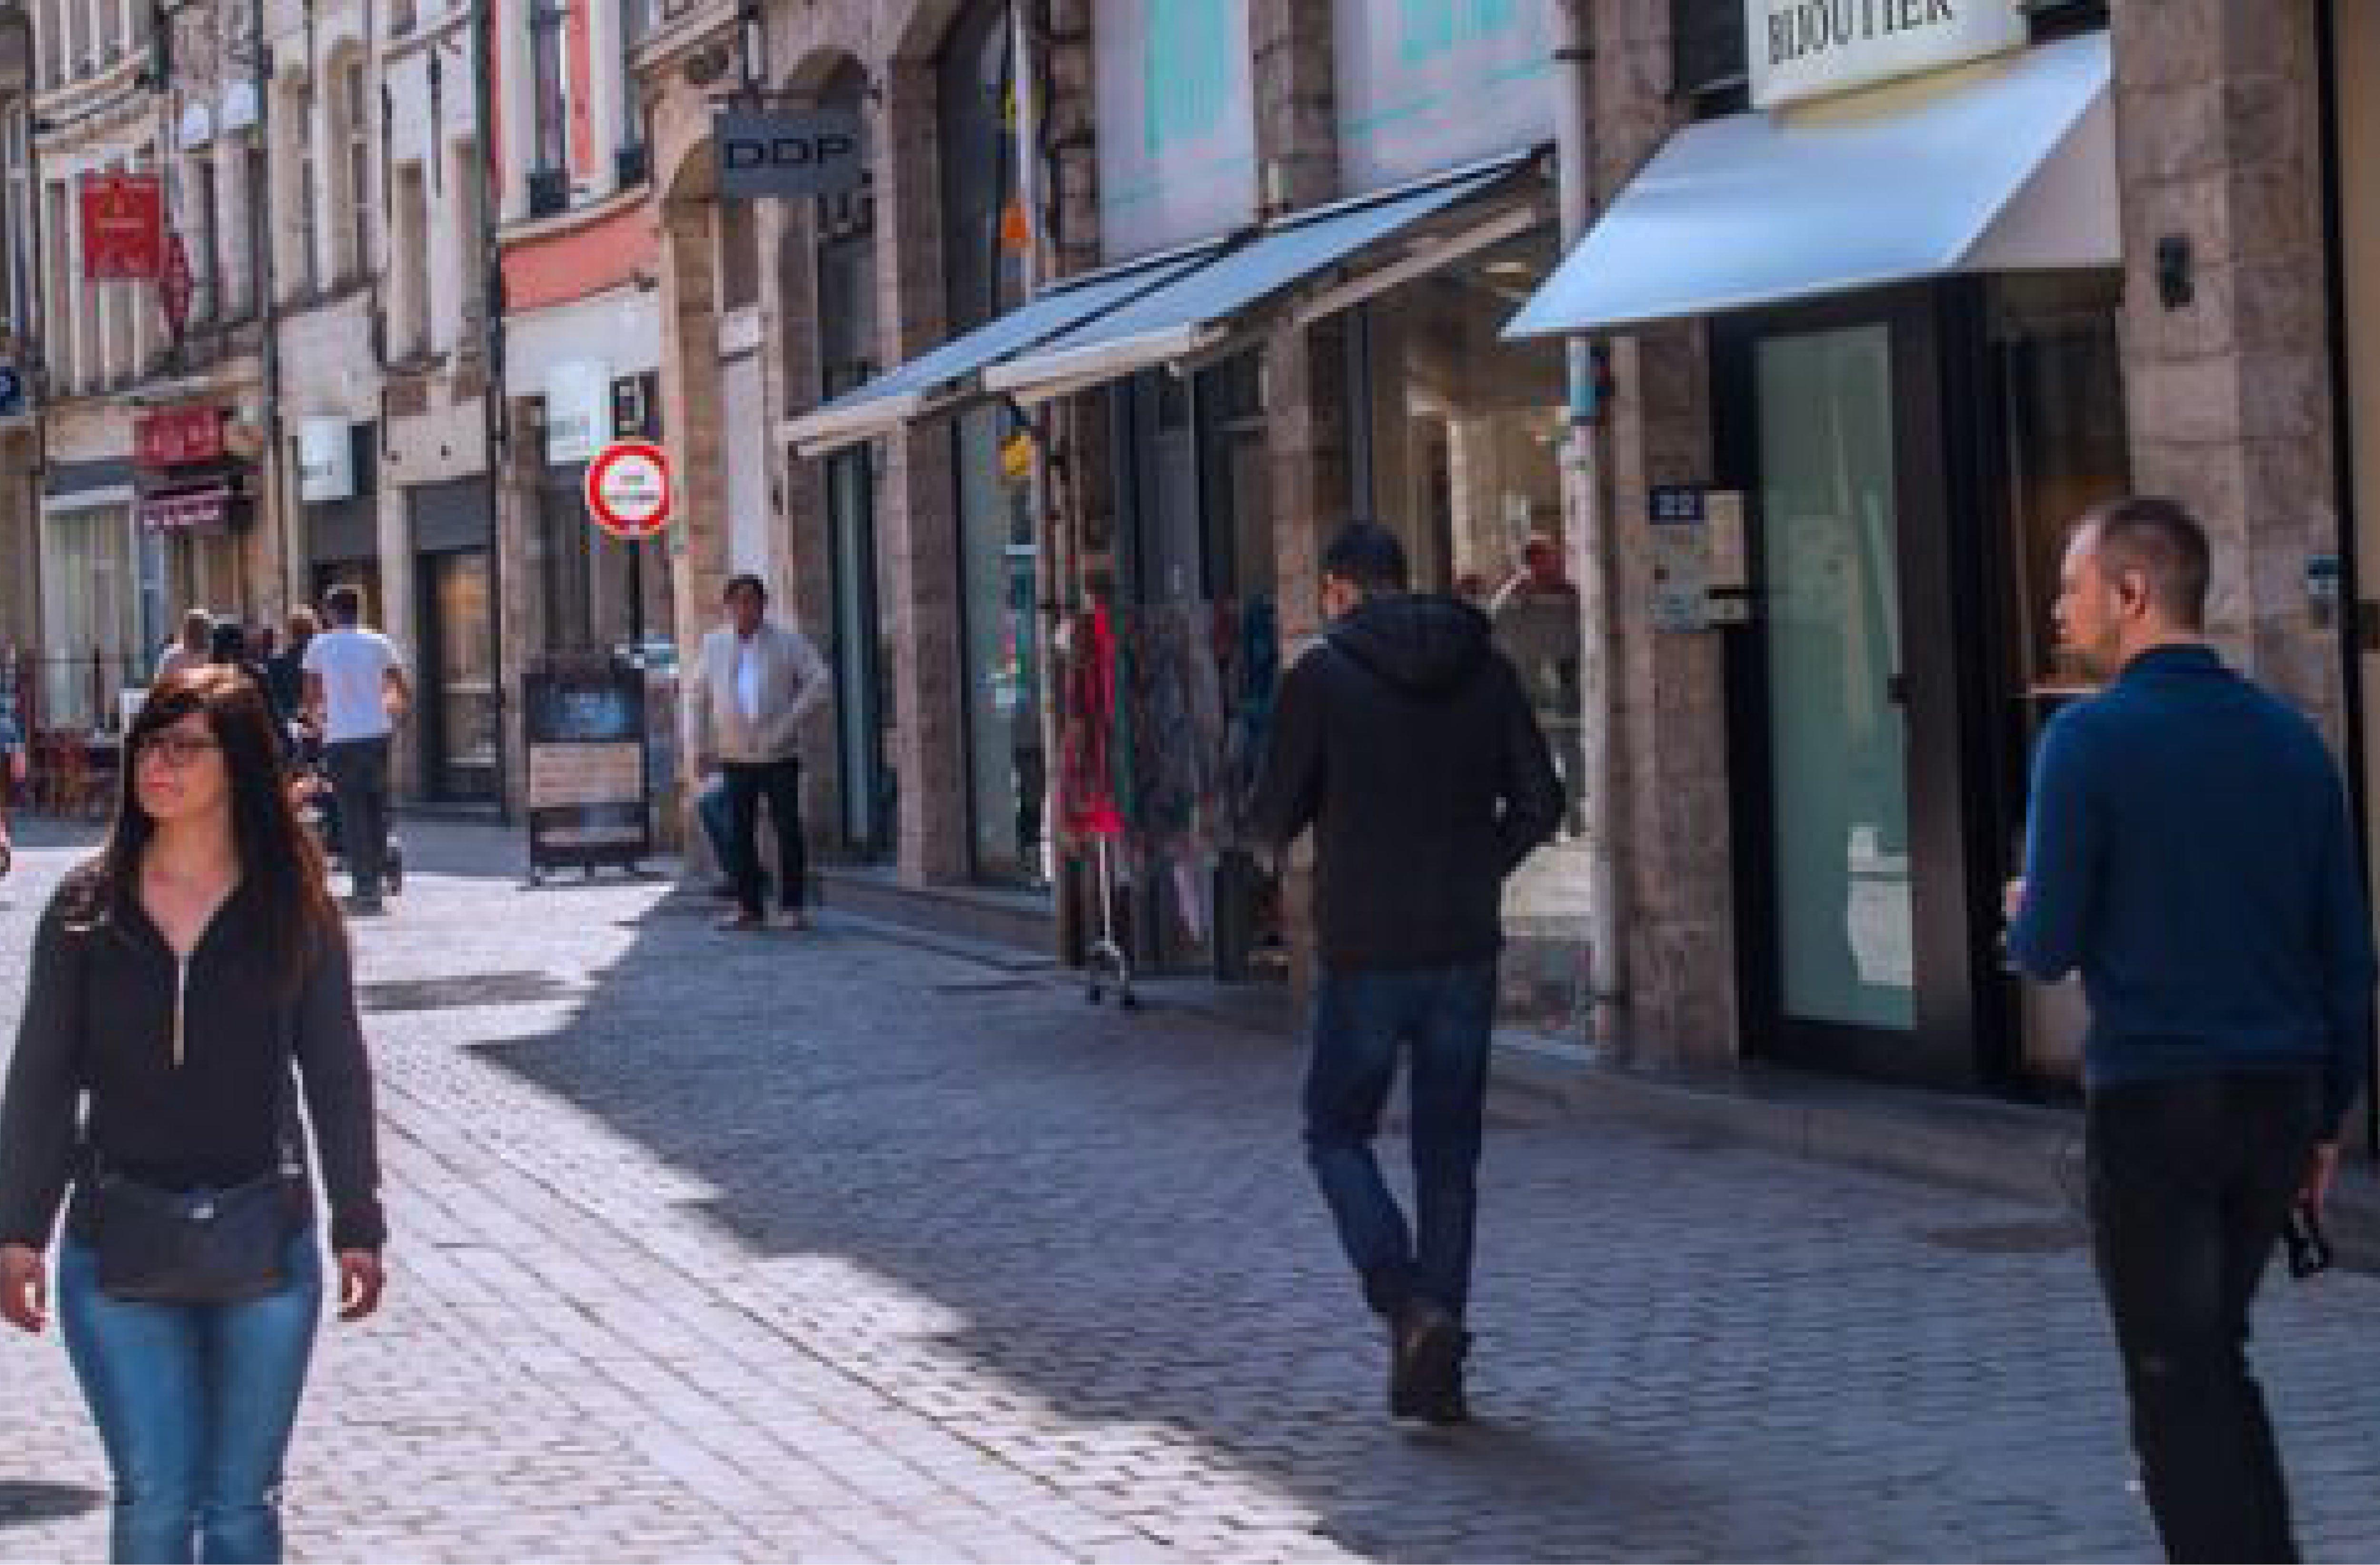 Commerce de la rue de Famars